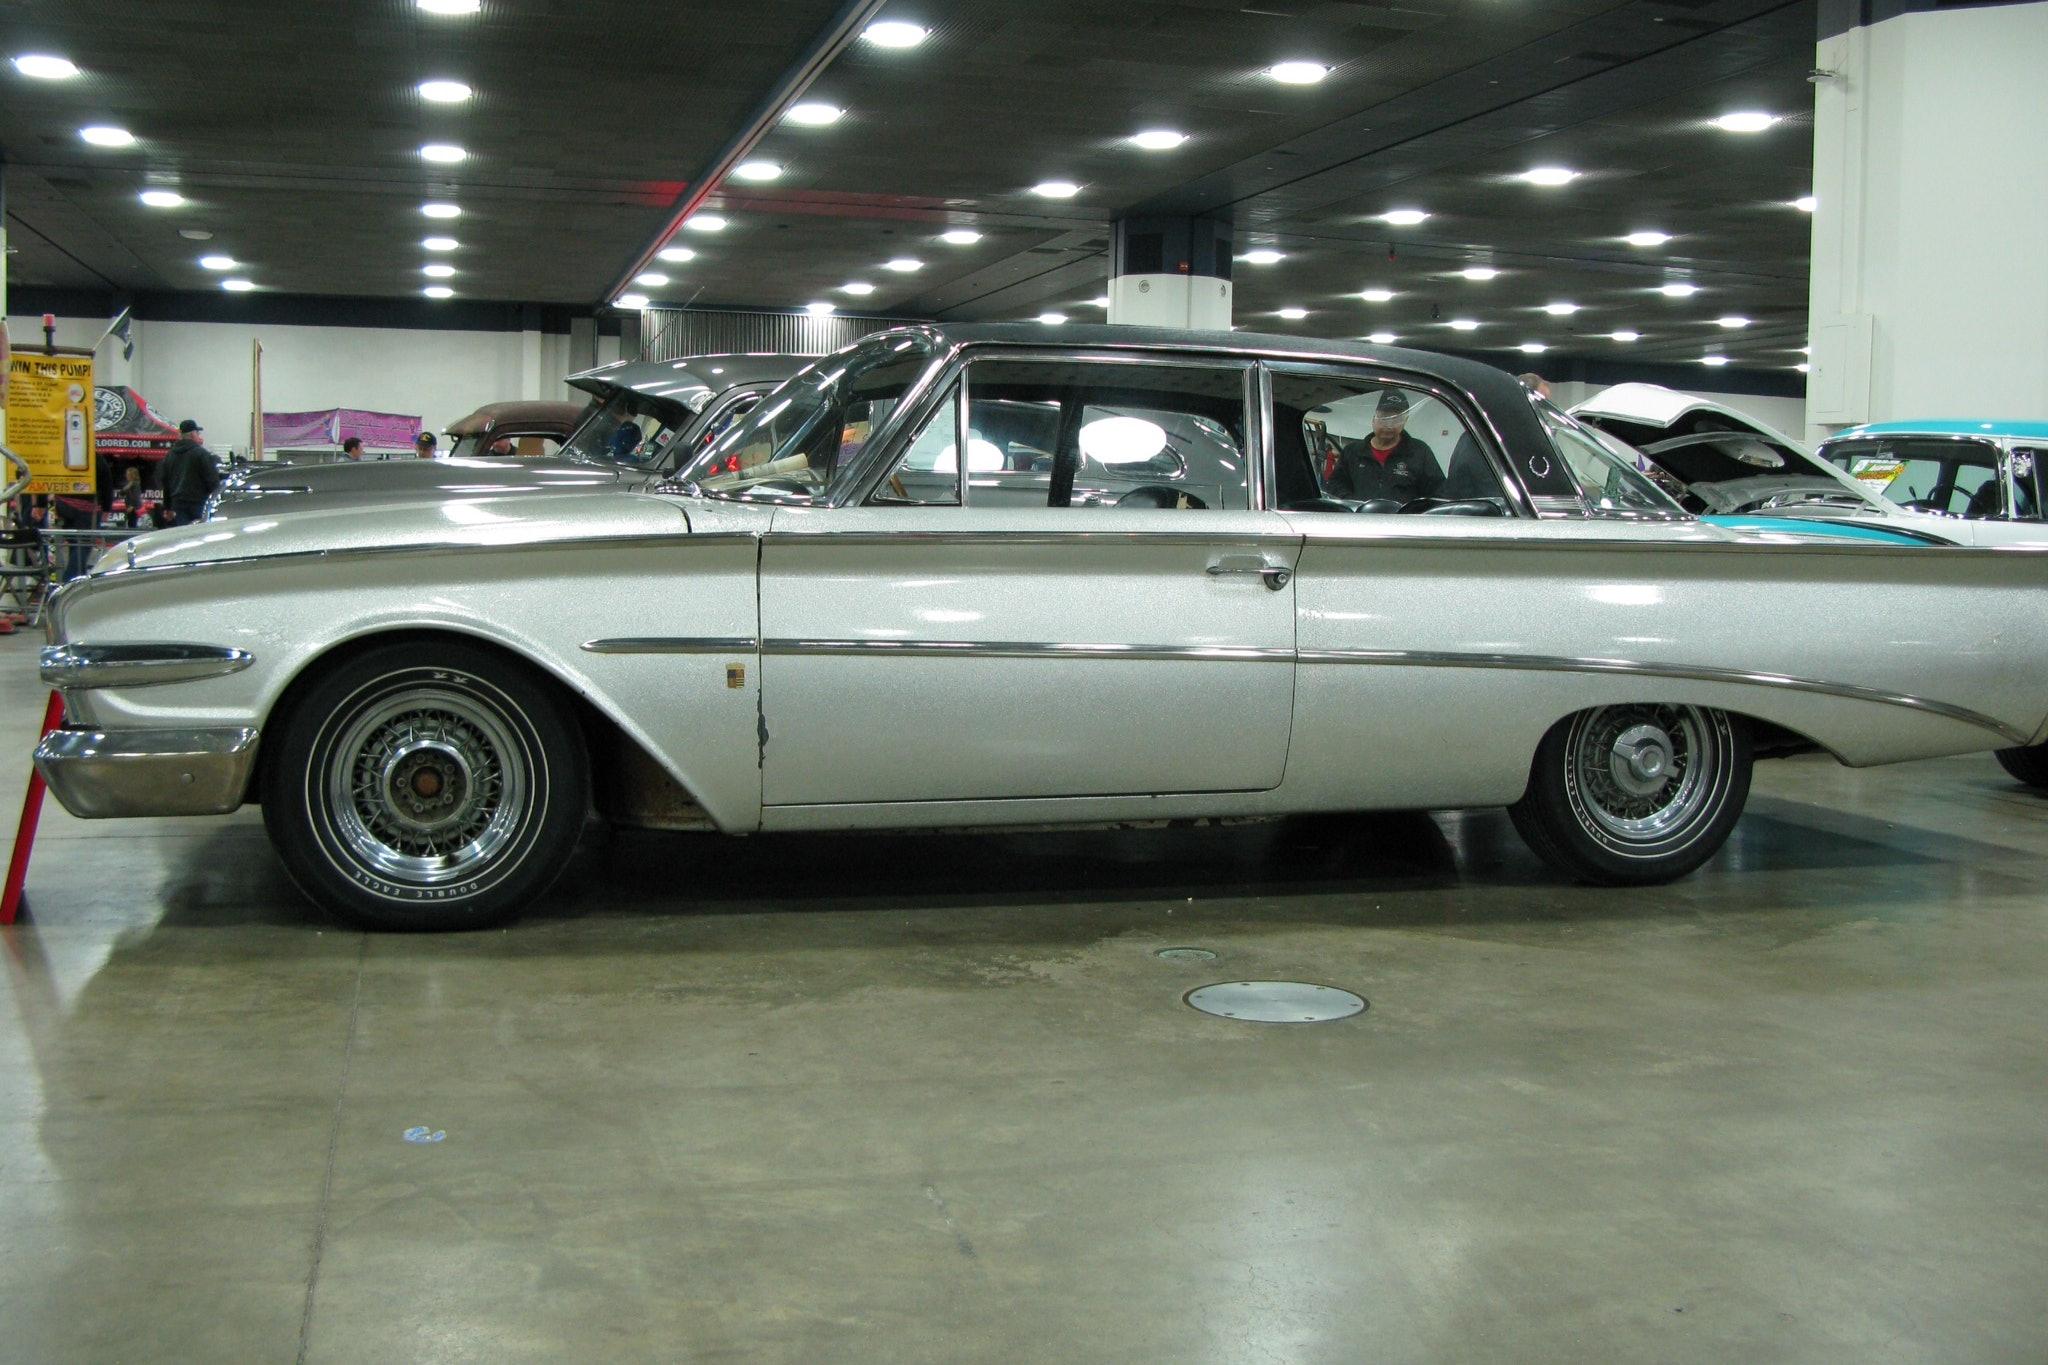 1960 Edsel Ranger 2 door sedan